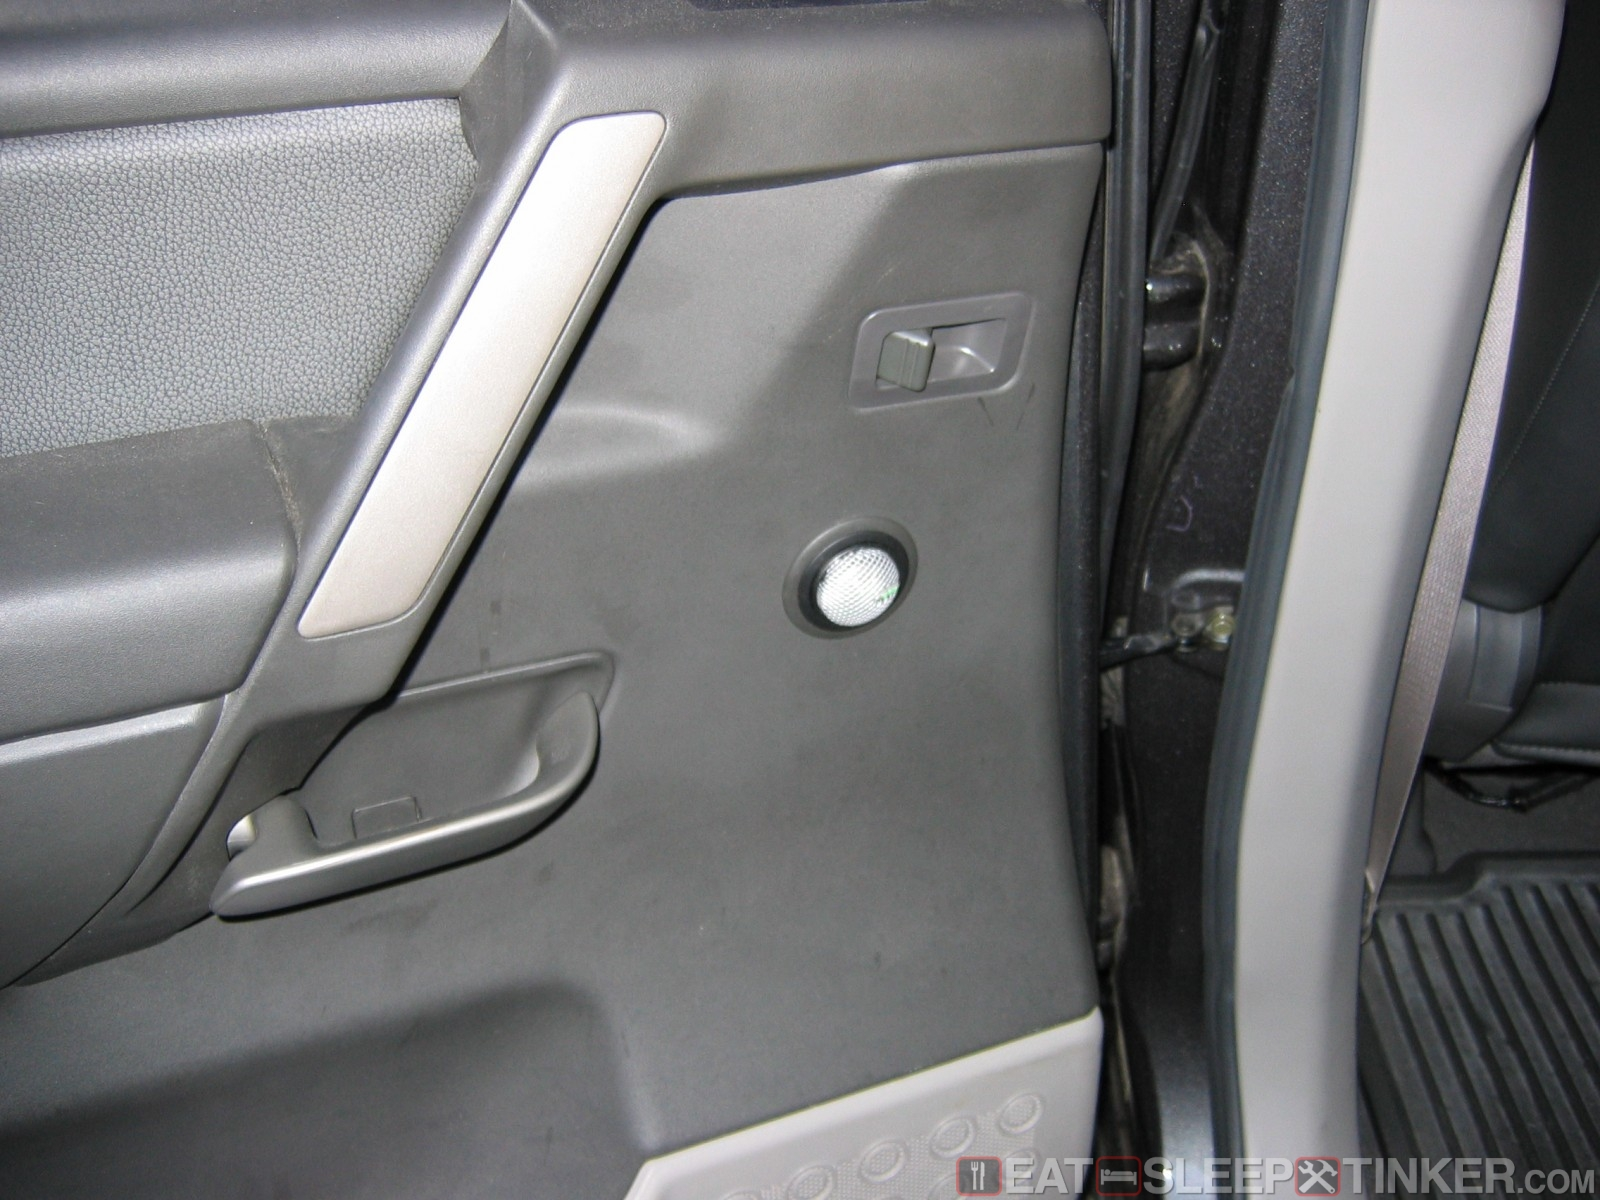 Rear Tweeter Installed In Stock Location & Eat Sleep Tinker.Installing component speakers in a Nissan Titan